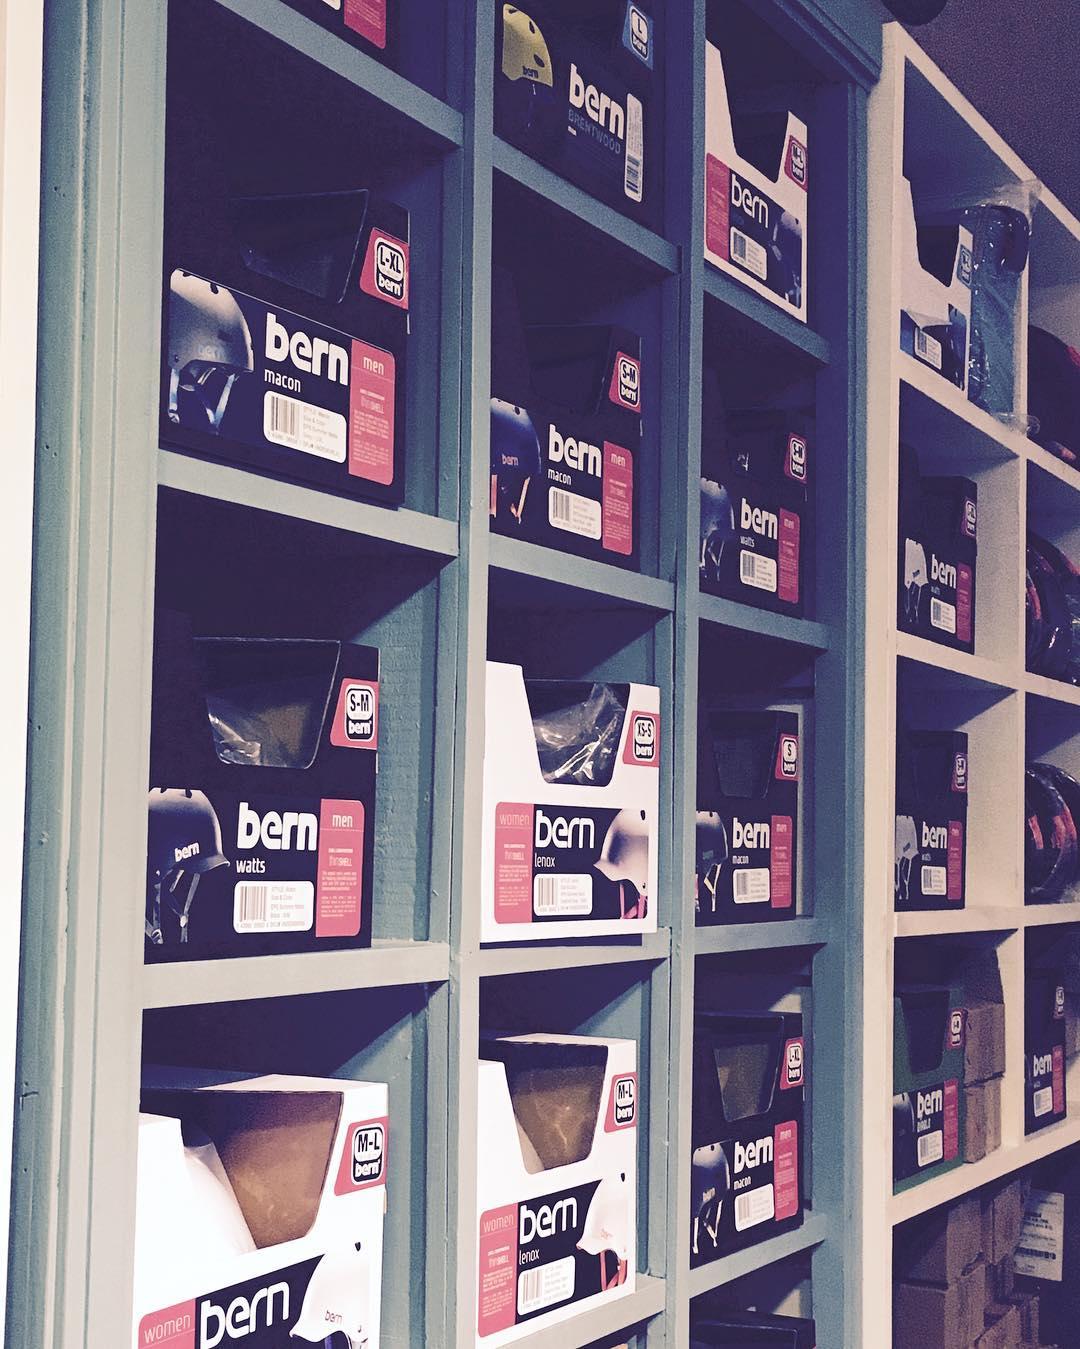 Llegaron los nuevos cascos BERN! #monochromebikes #ilovemymonochrome #bern